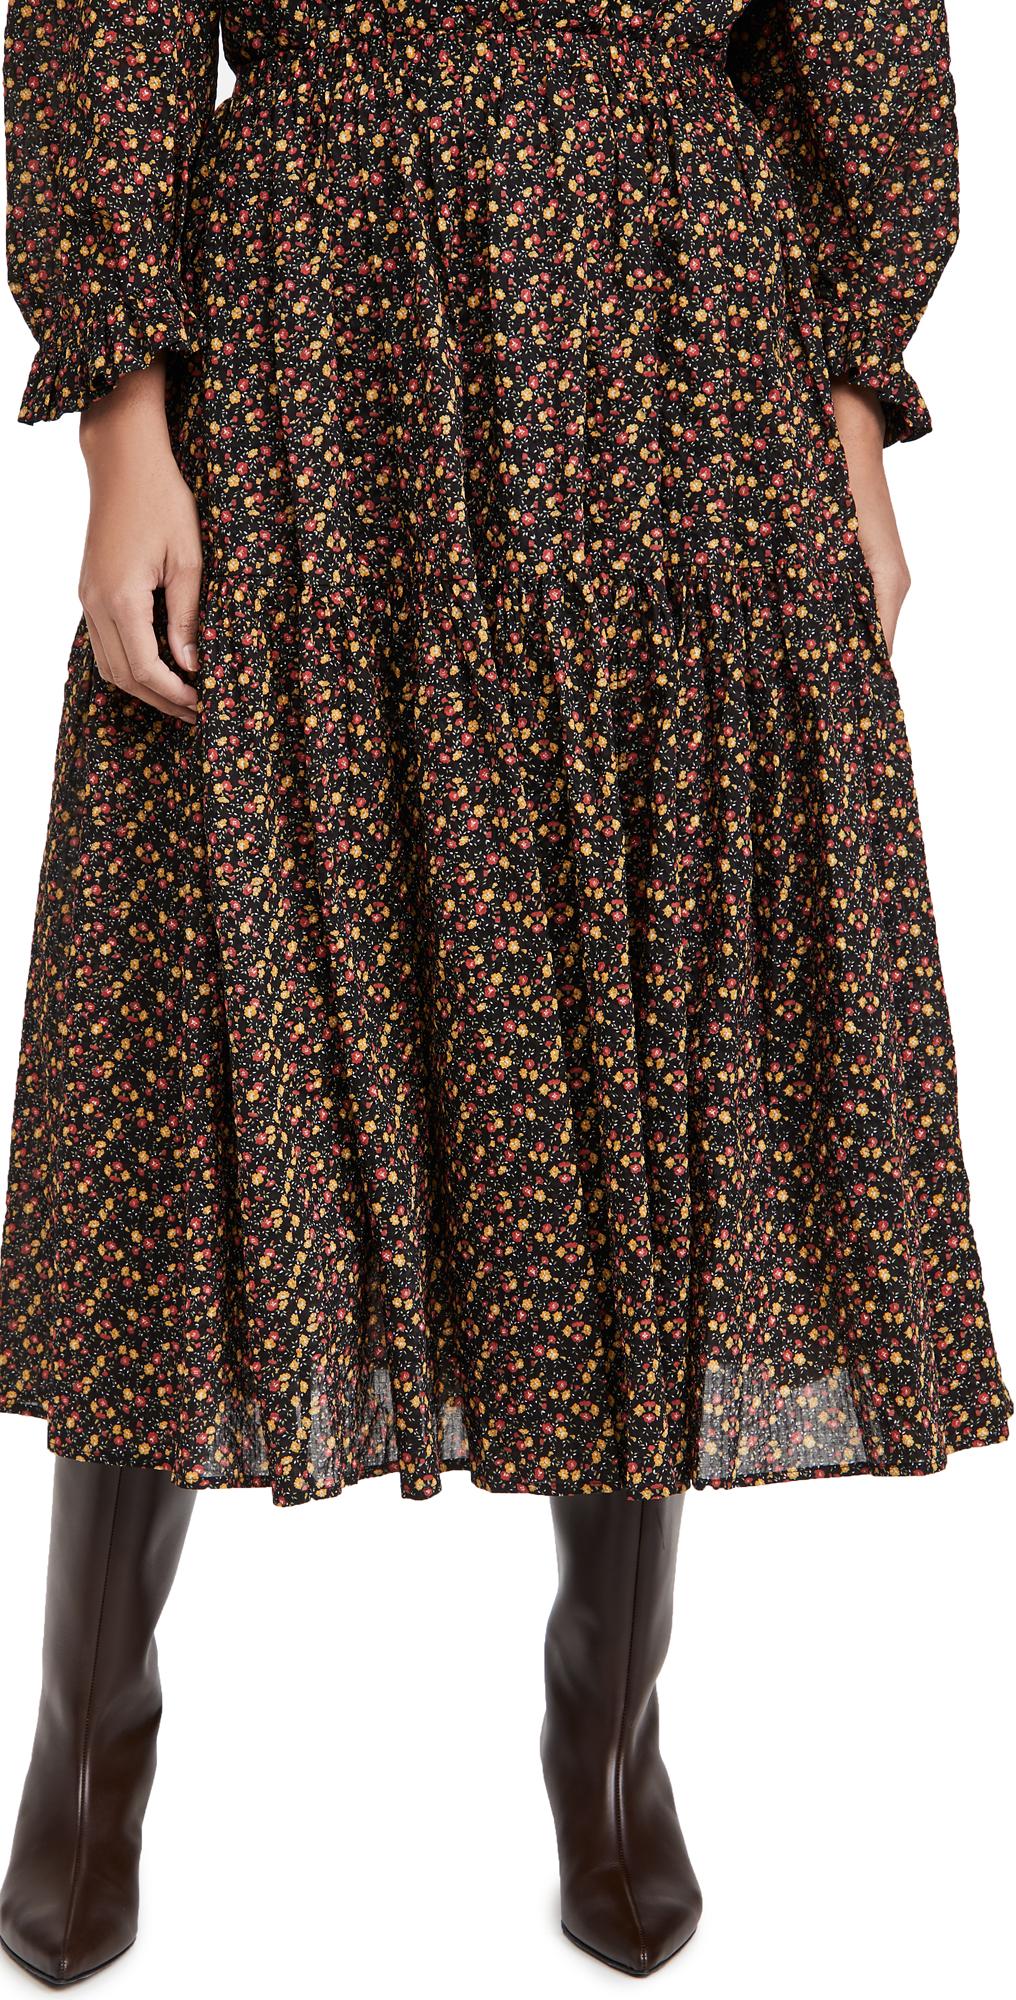 Naya Rea Lesia Skirt